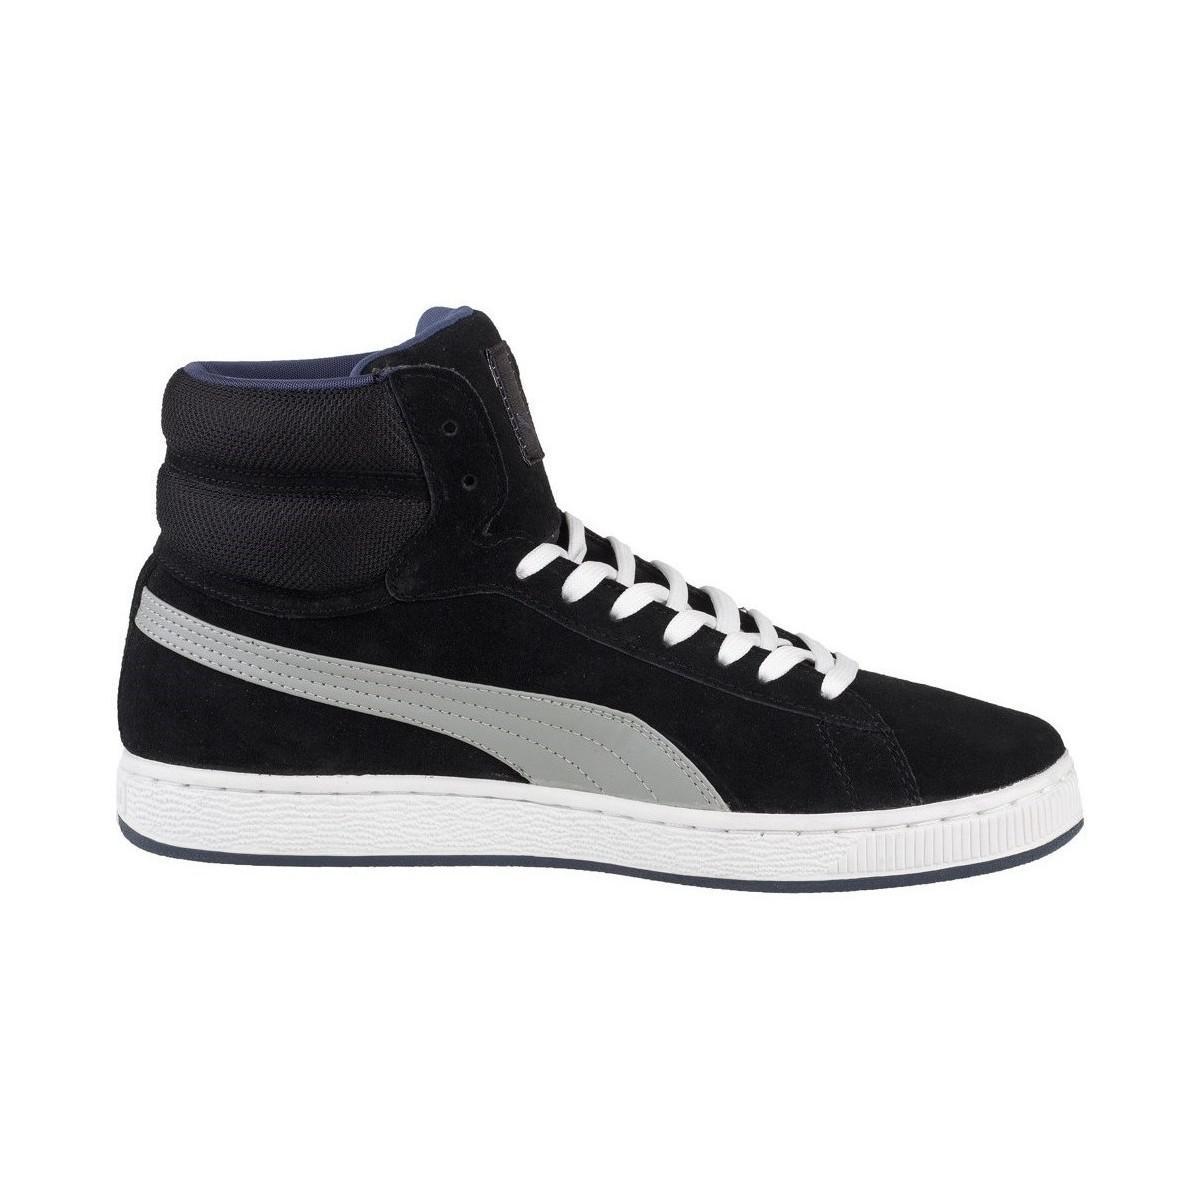 Chaussures Puma Cross Shot Mesh VpMmg